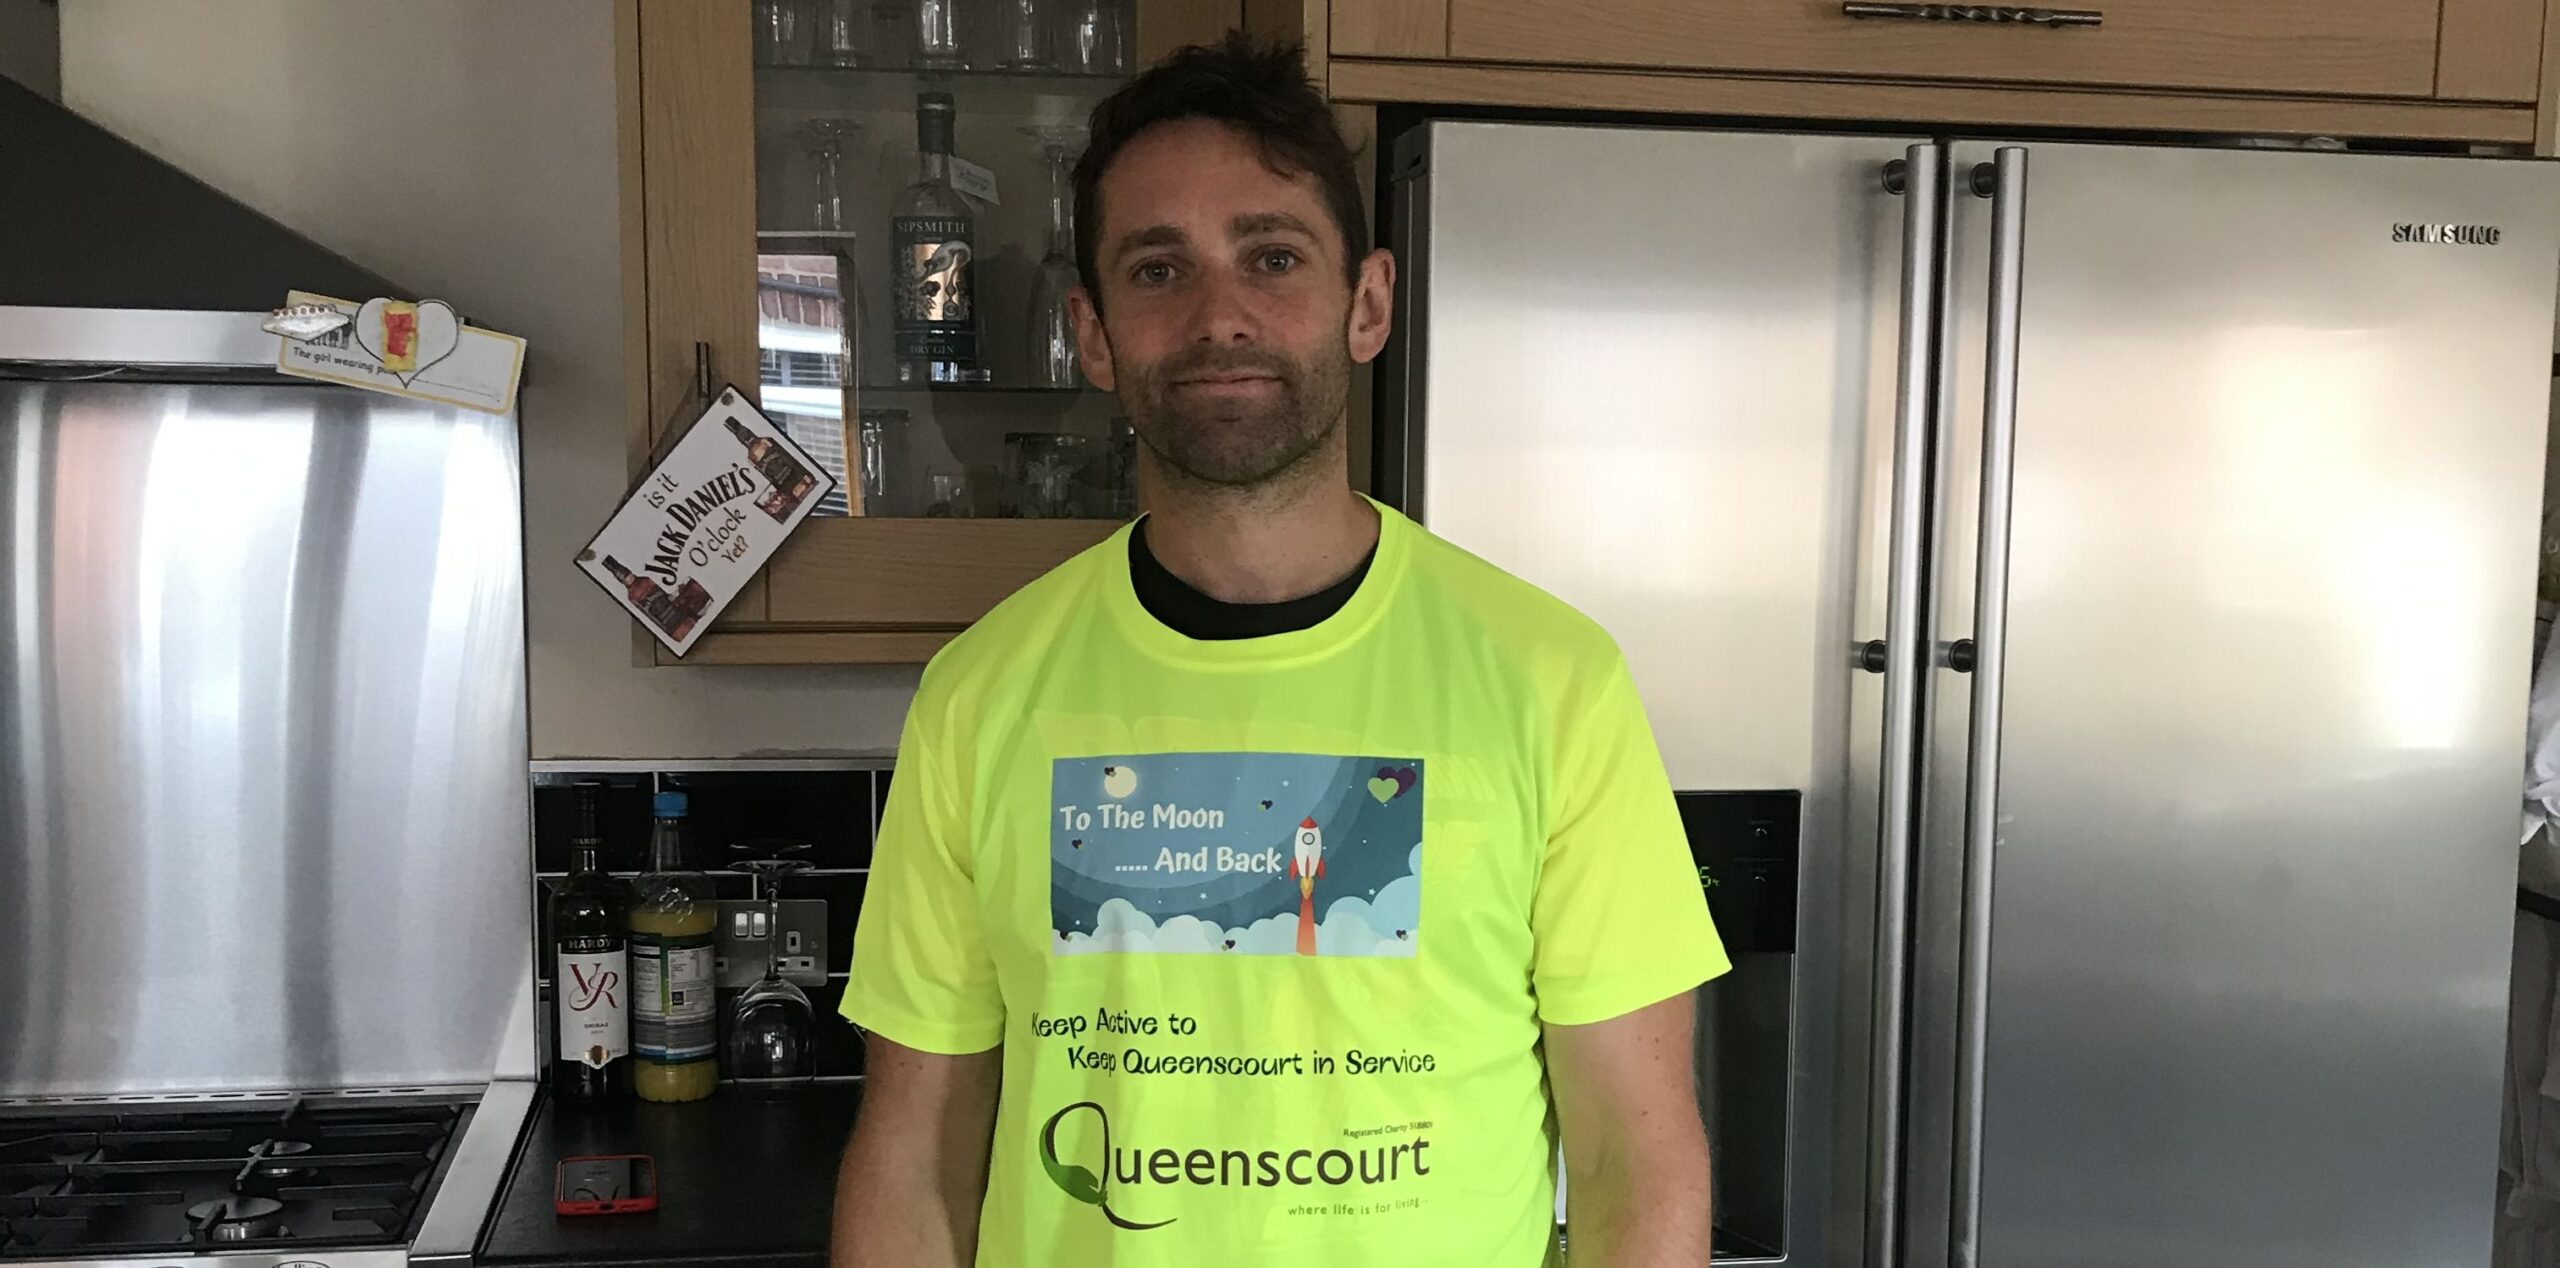 Andrew Johnson is raising money for Queenscourt Hospice